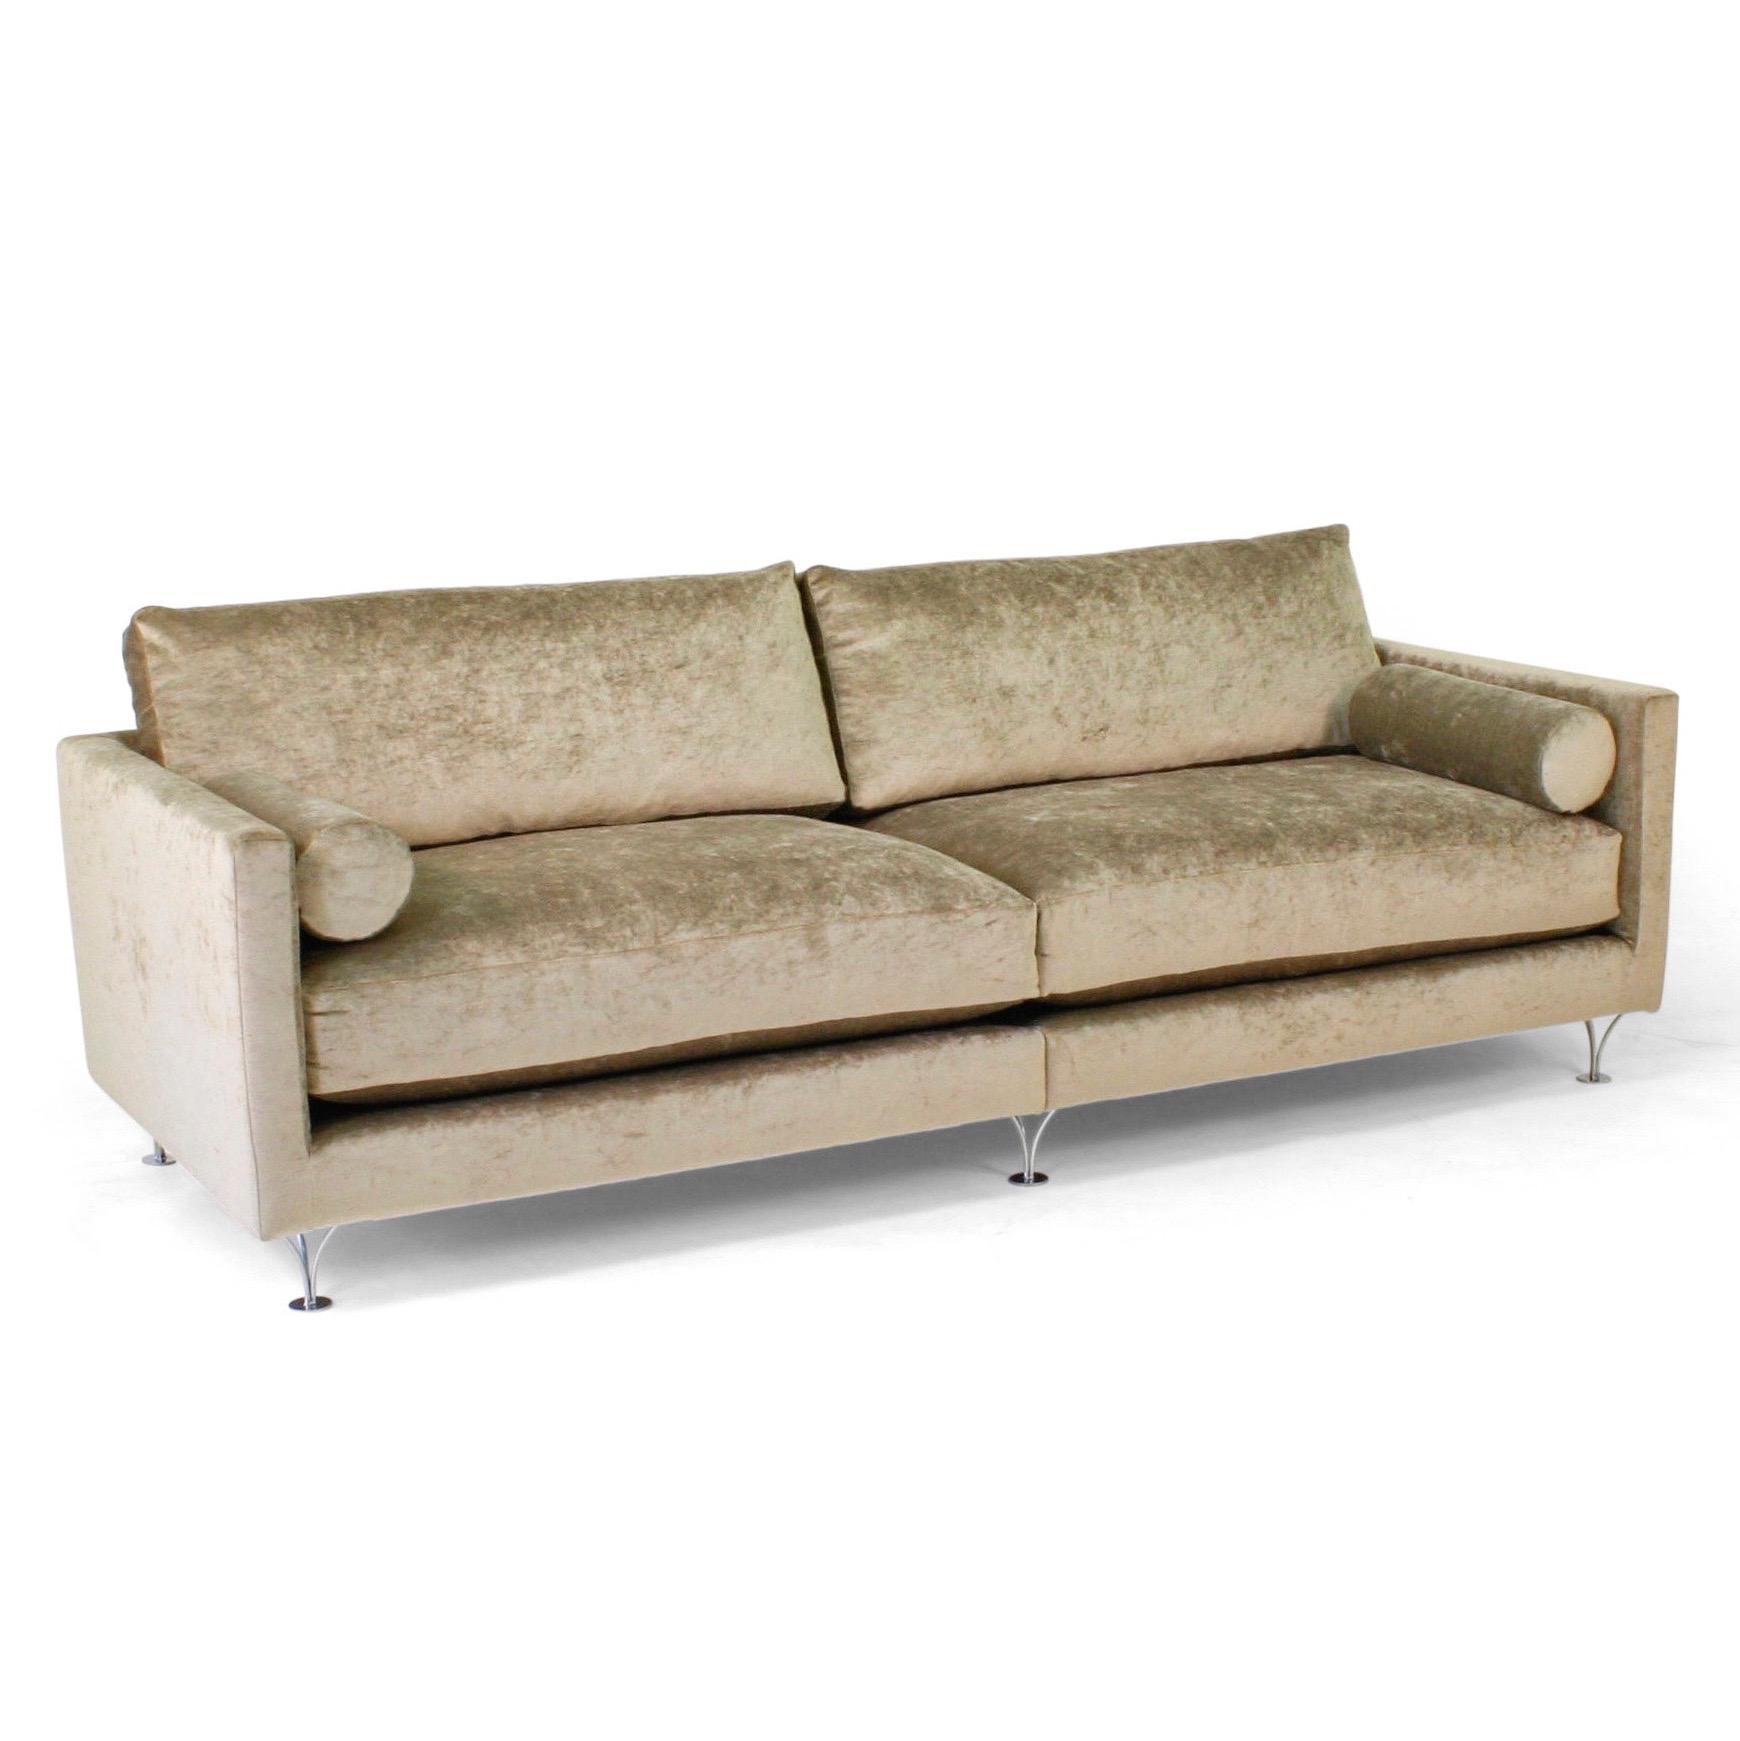 Miraculous Deep Soft Norell Furniture Unemploymentrelief Wooden Chair Designs For Living Room Unemploymentrelieforg